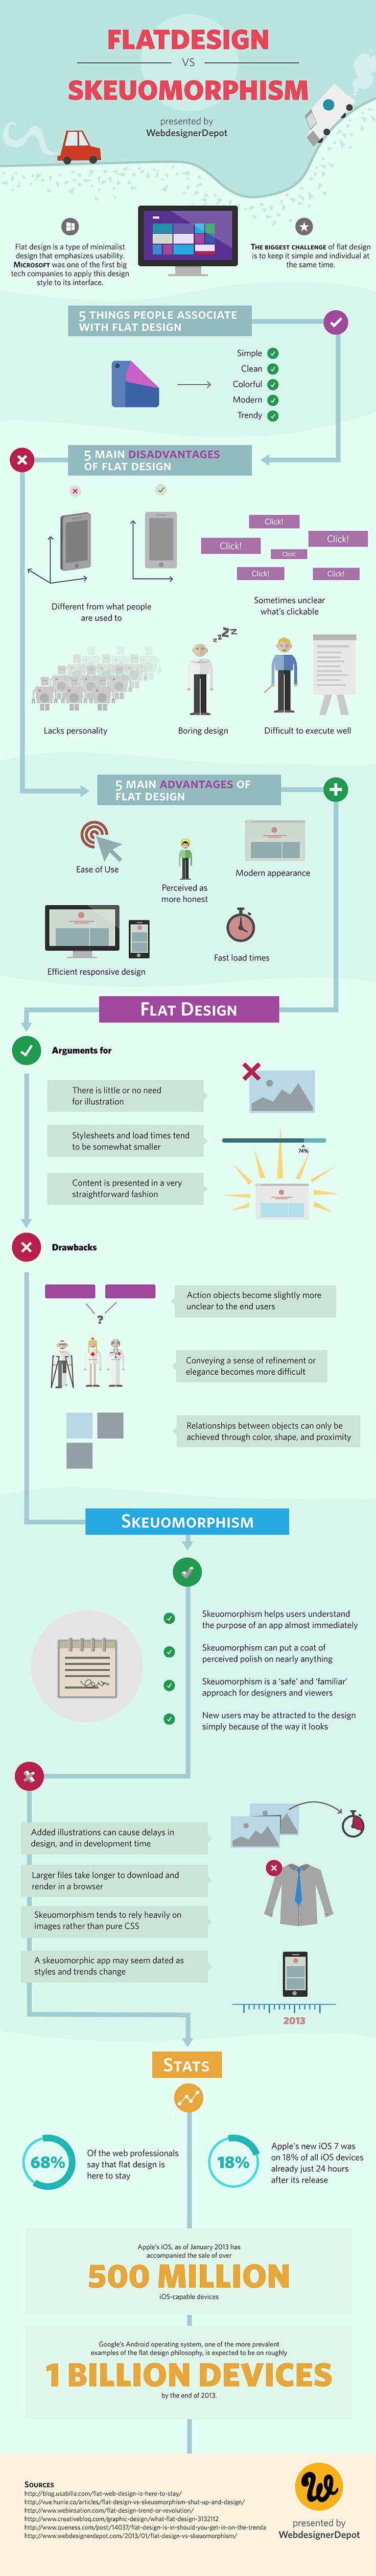 Flat Design vs. Skeuomorphismus Quelle: http://www.webdesignerdepot.com/2013/12/infographic-flat-design-vs-skeuomorphism/